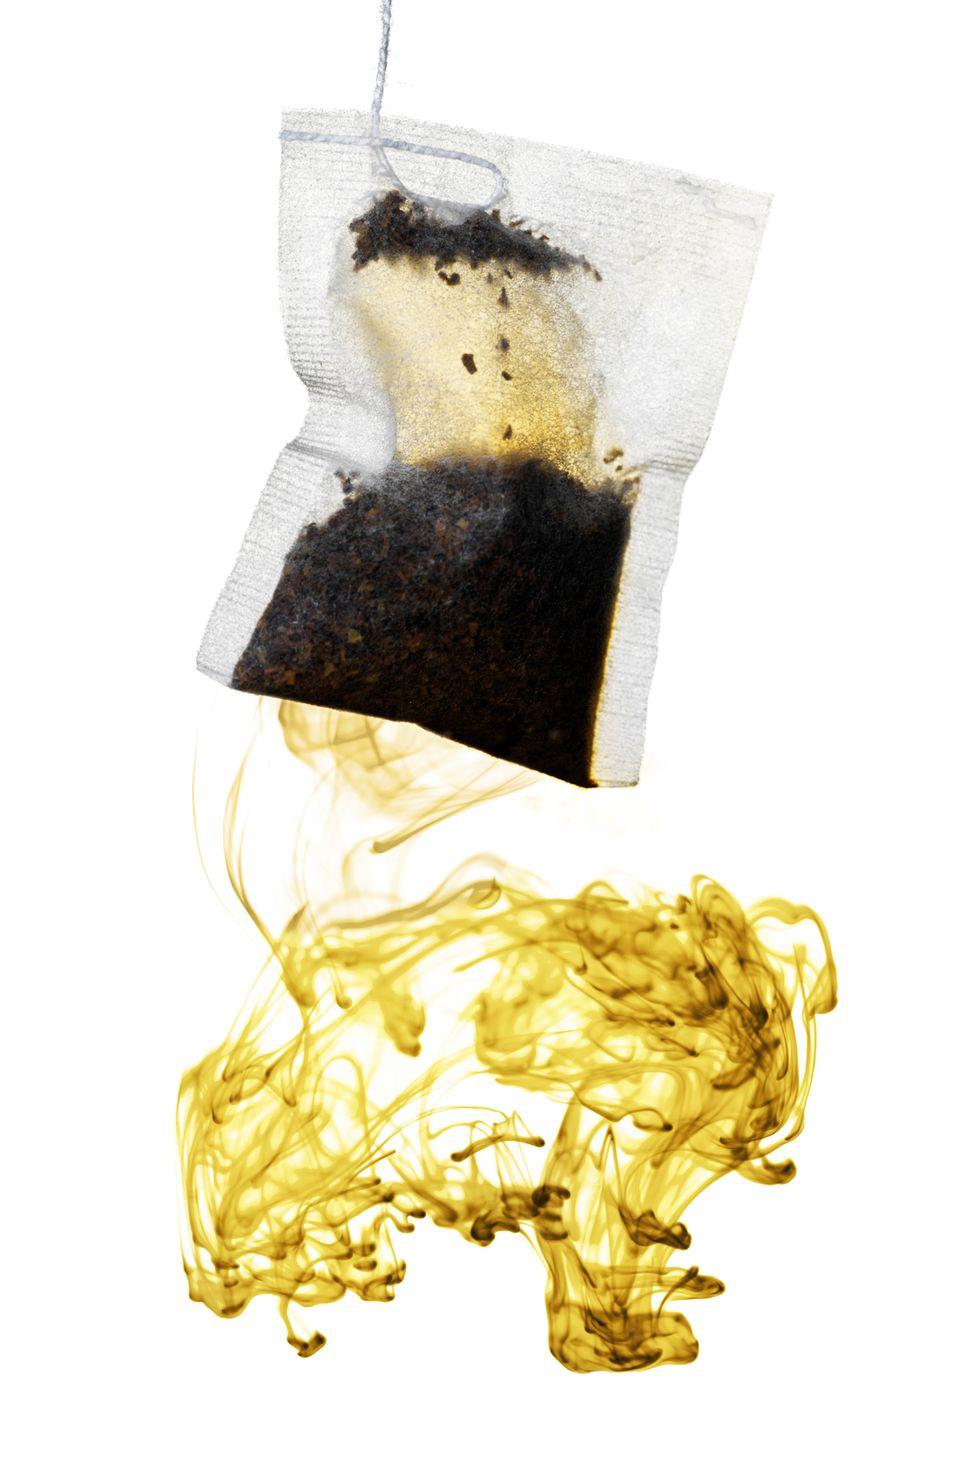 Organic orange pekoe teabag, with swirls